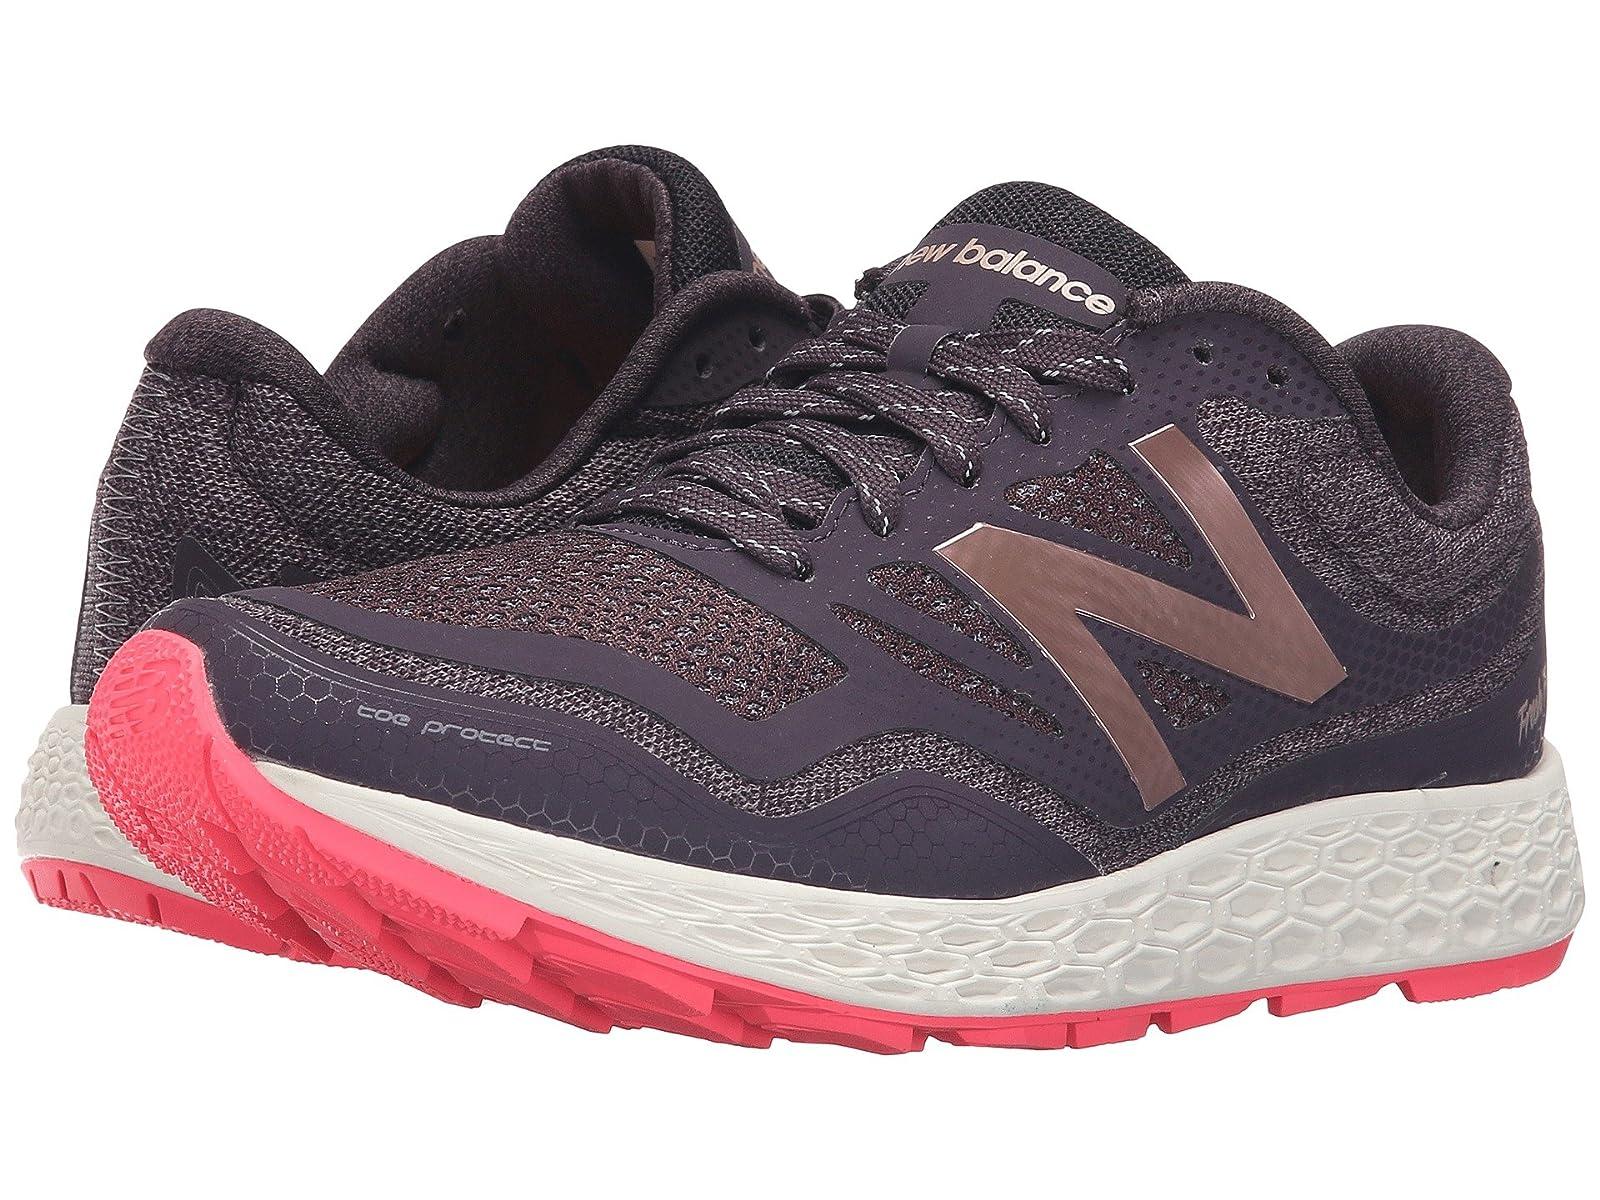 New Balance Fresh Foam GobiCheap and distinctive eye-catching shoes